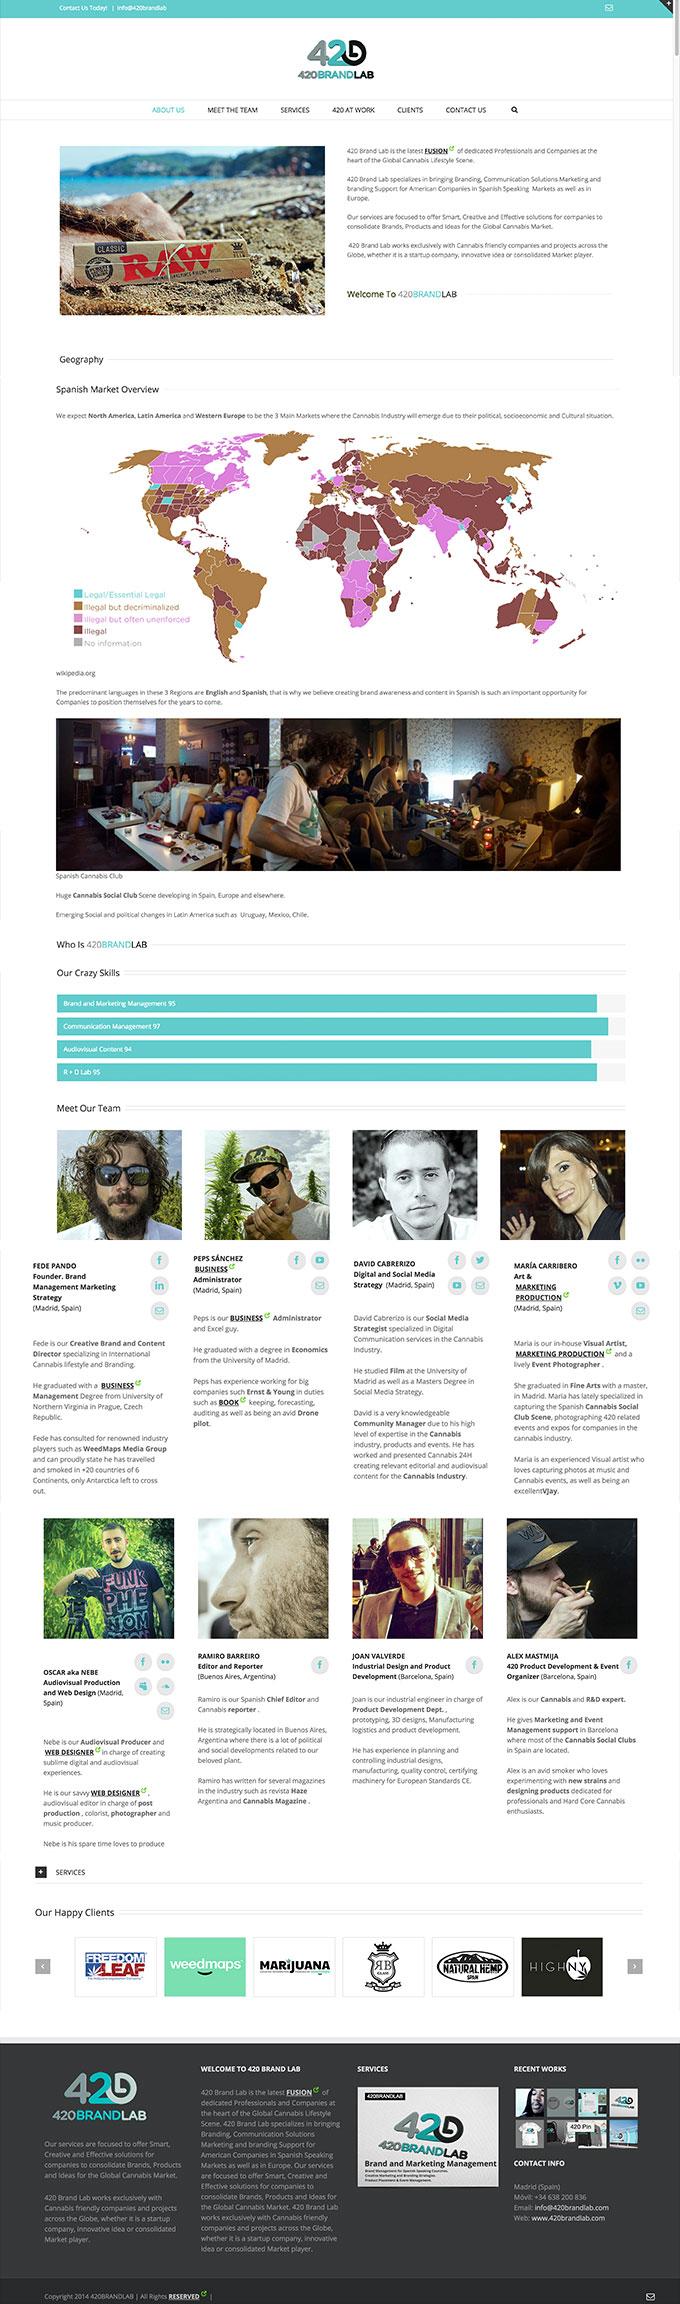 WEB 420 BRAND LAB